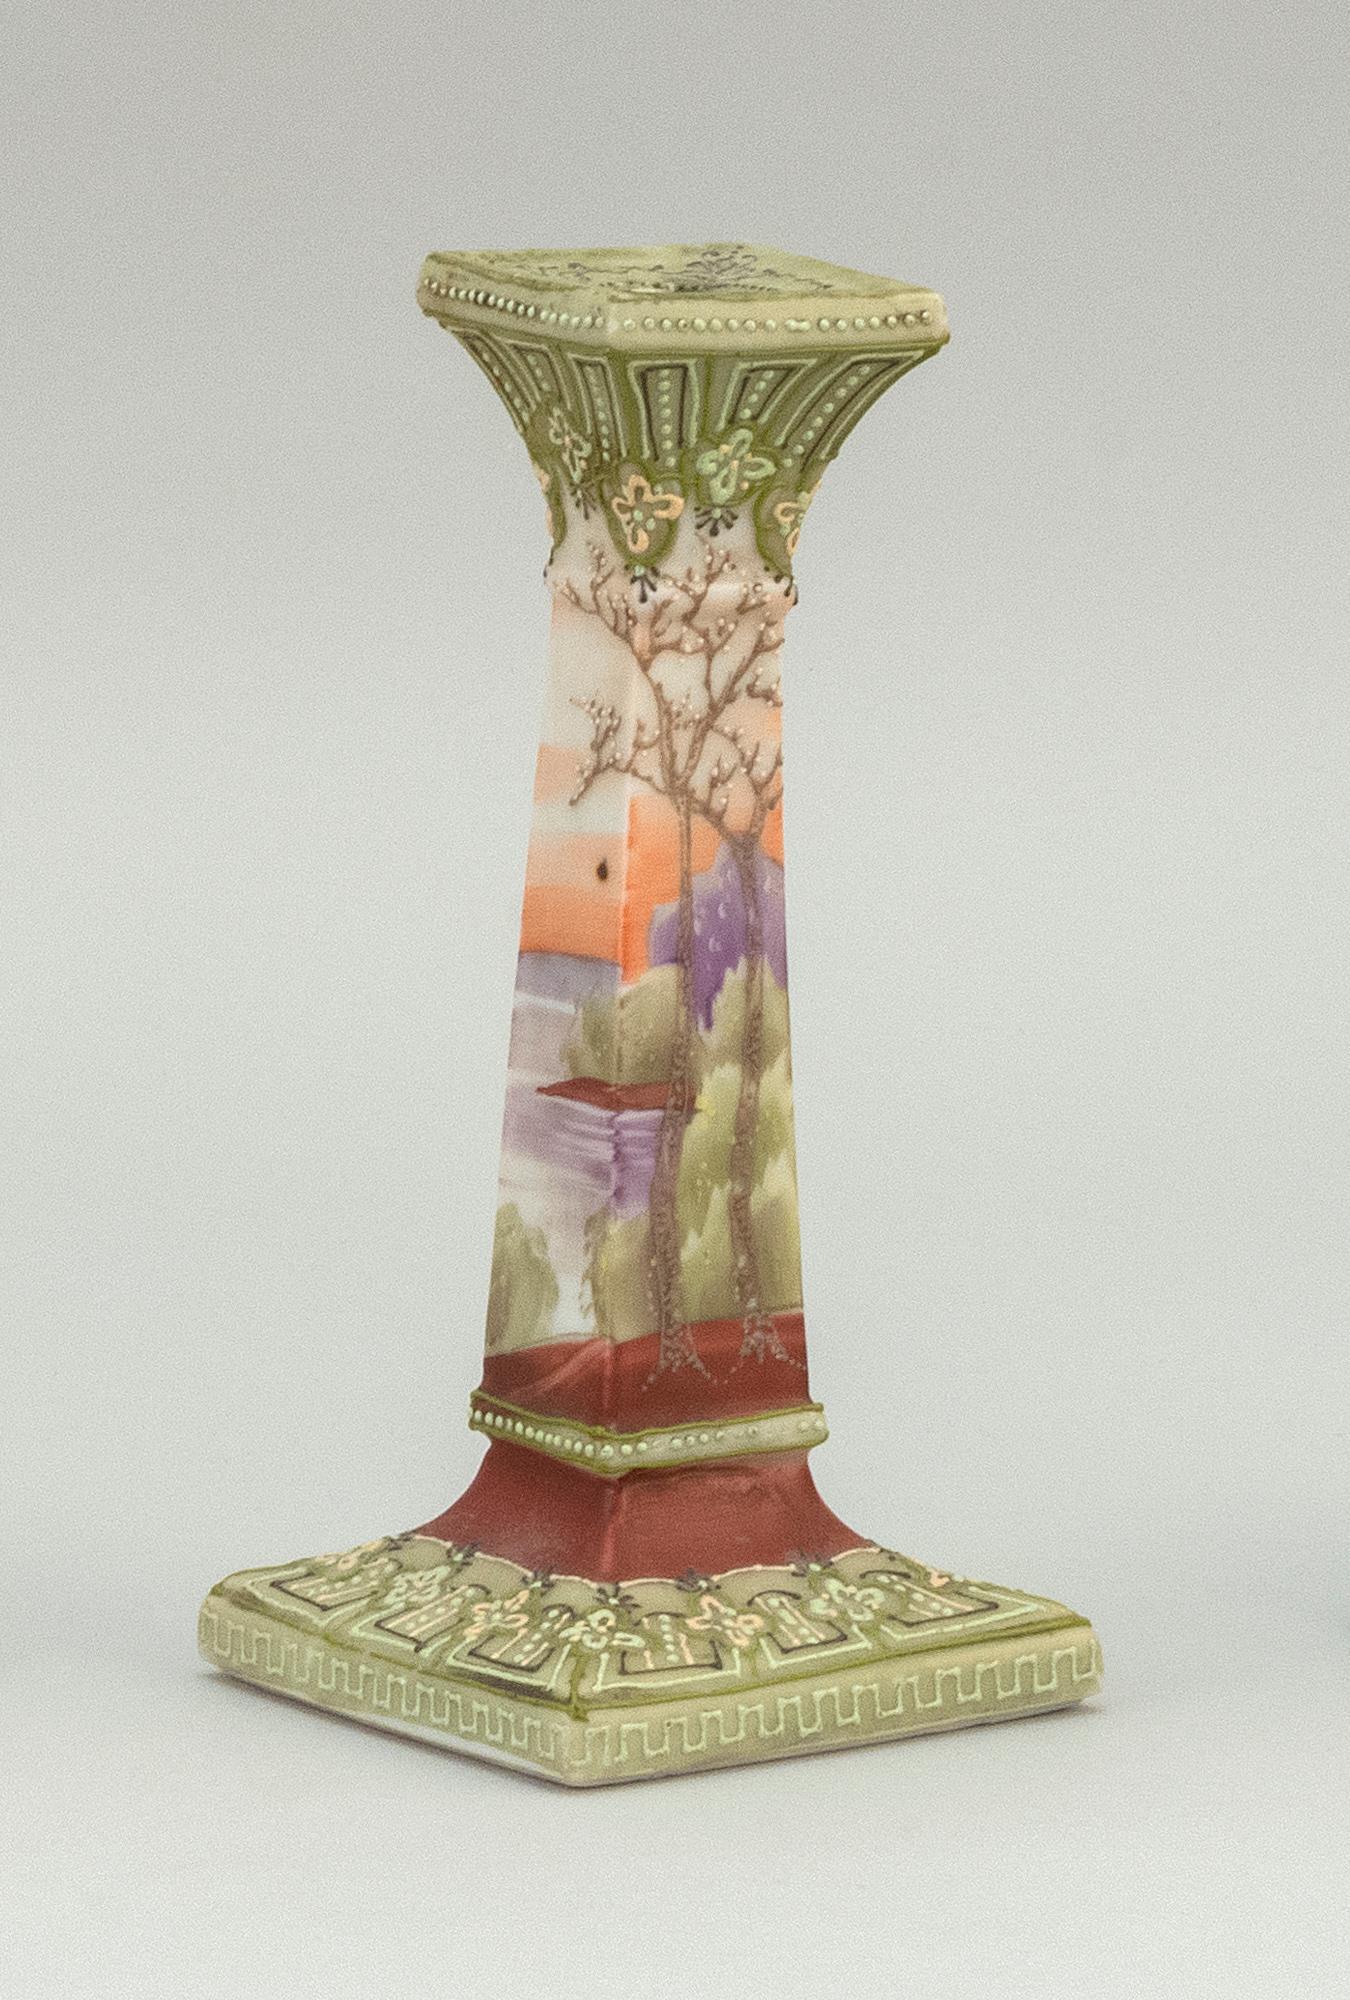 "MORIAGE NIPPON PORCELAIN CANDLESTICK With landscape design. Van Patten #52 mark on base. Height 7.5""."